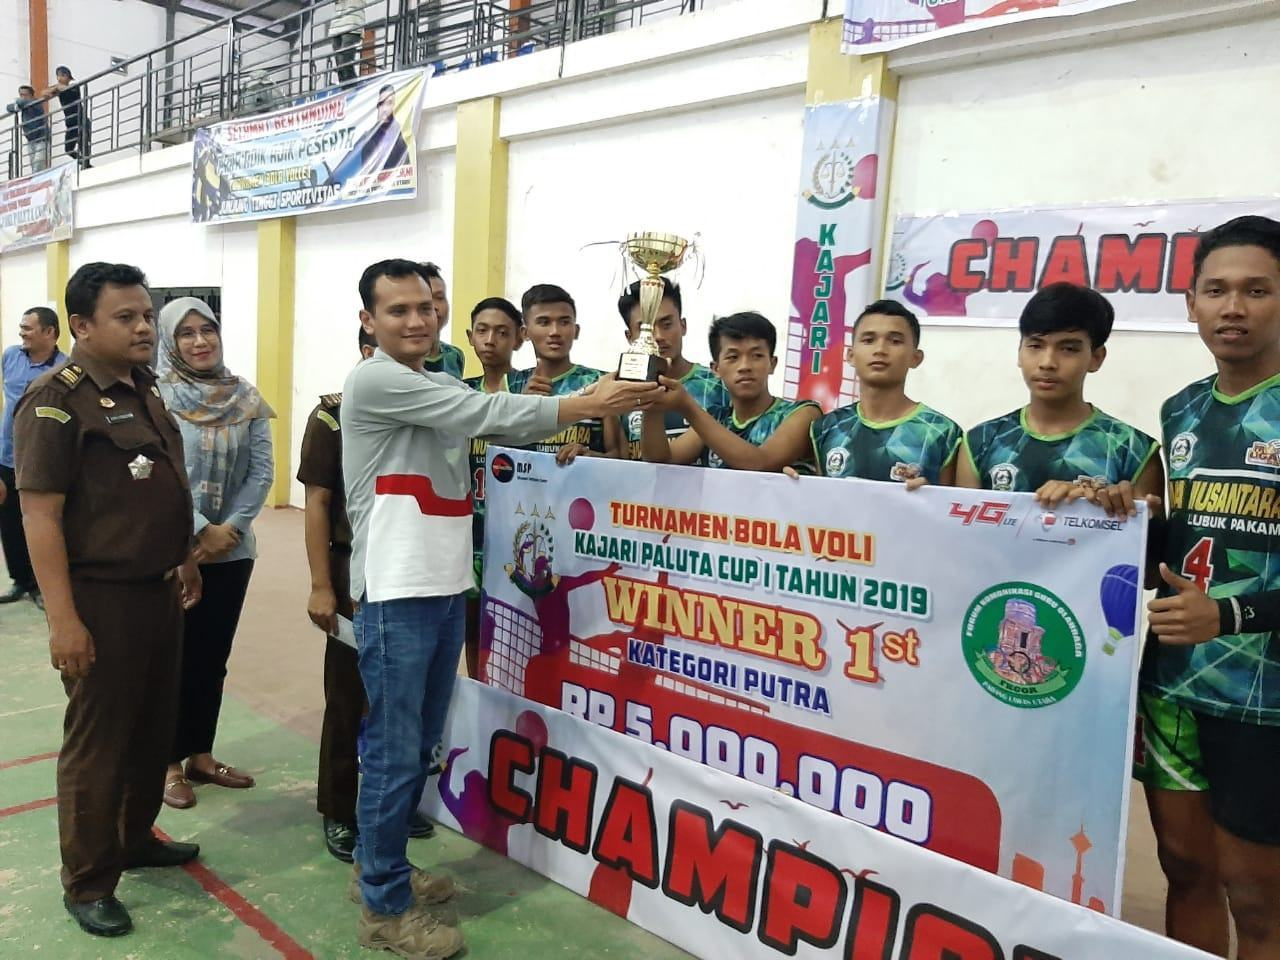 Deli Serdang, Borong Tournament Voly Kajari Paluta Cup I